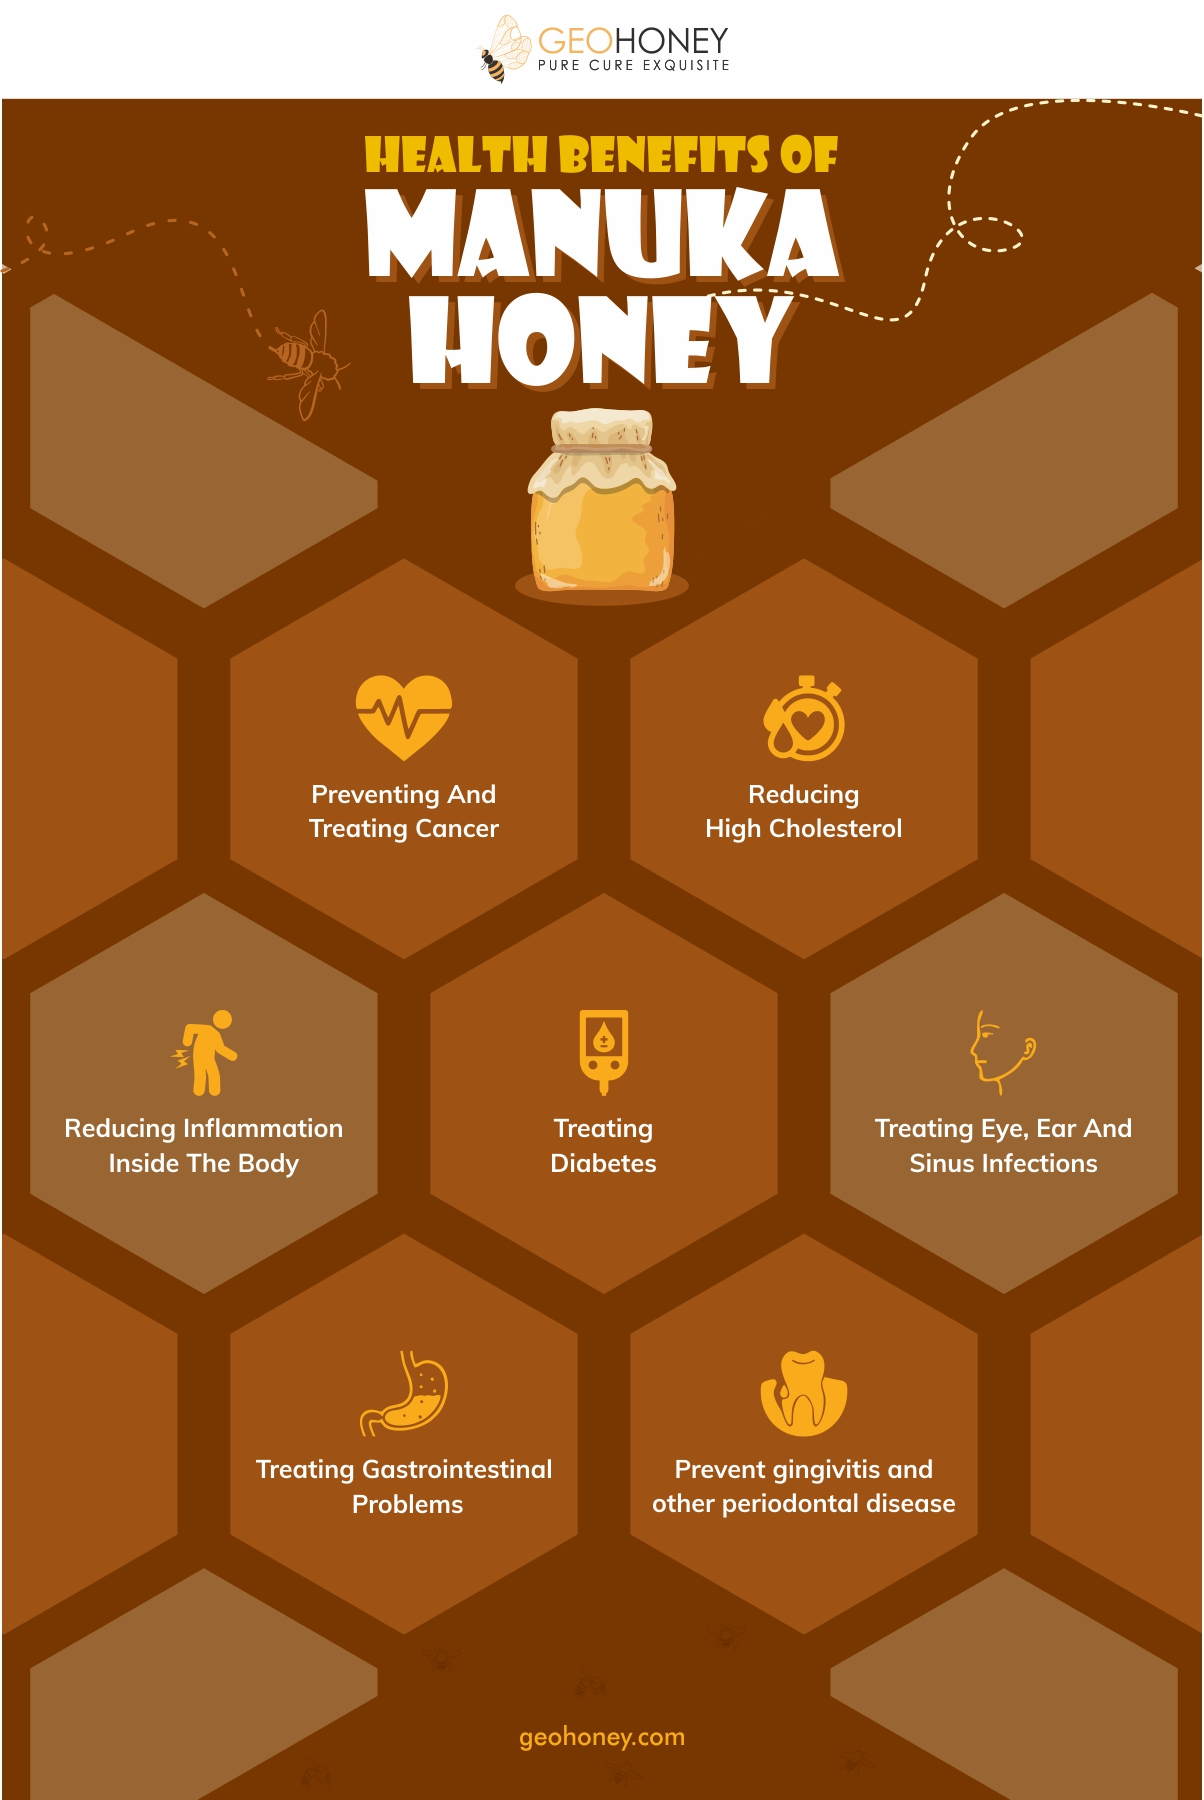 Manuka honey Benefits - GeoHoney